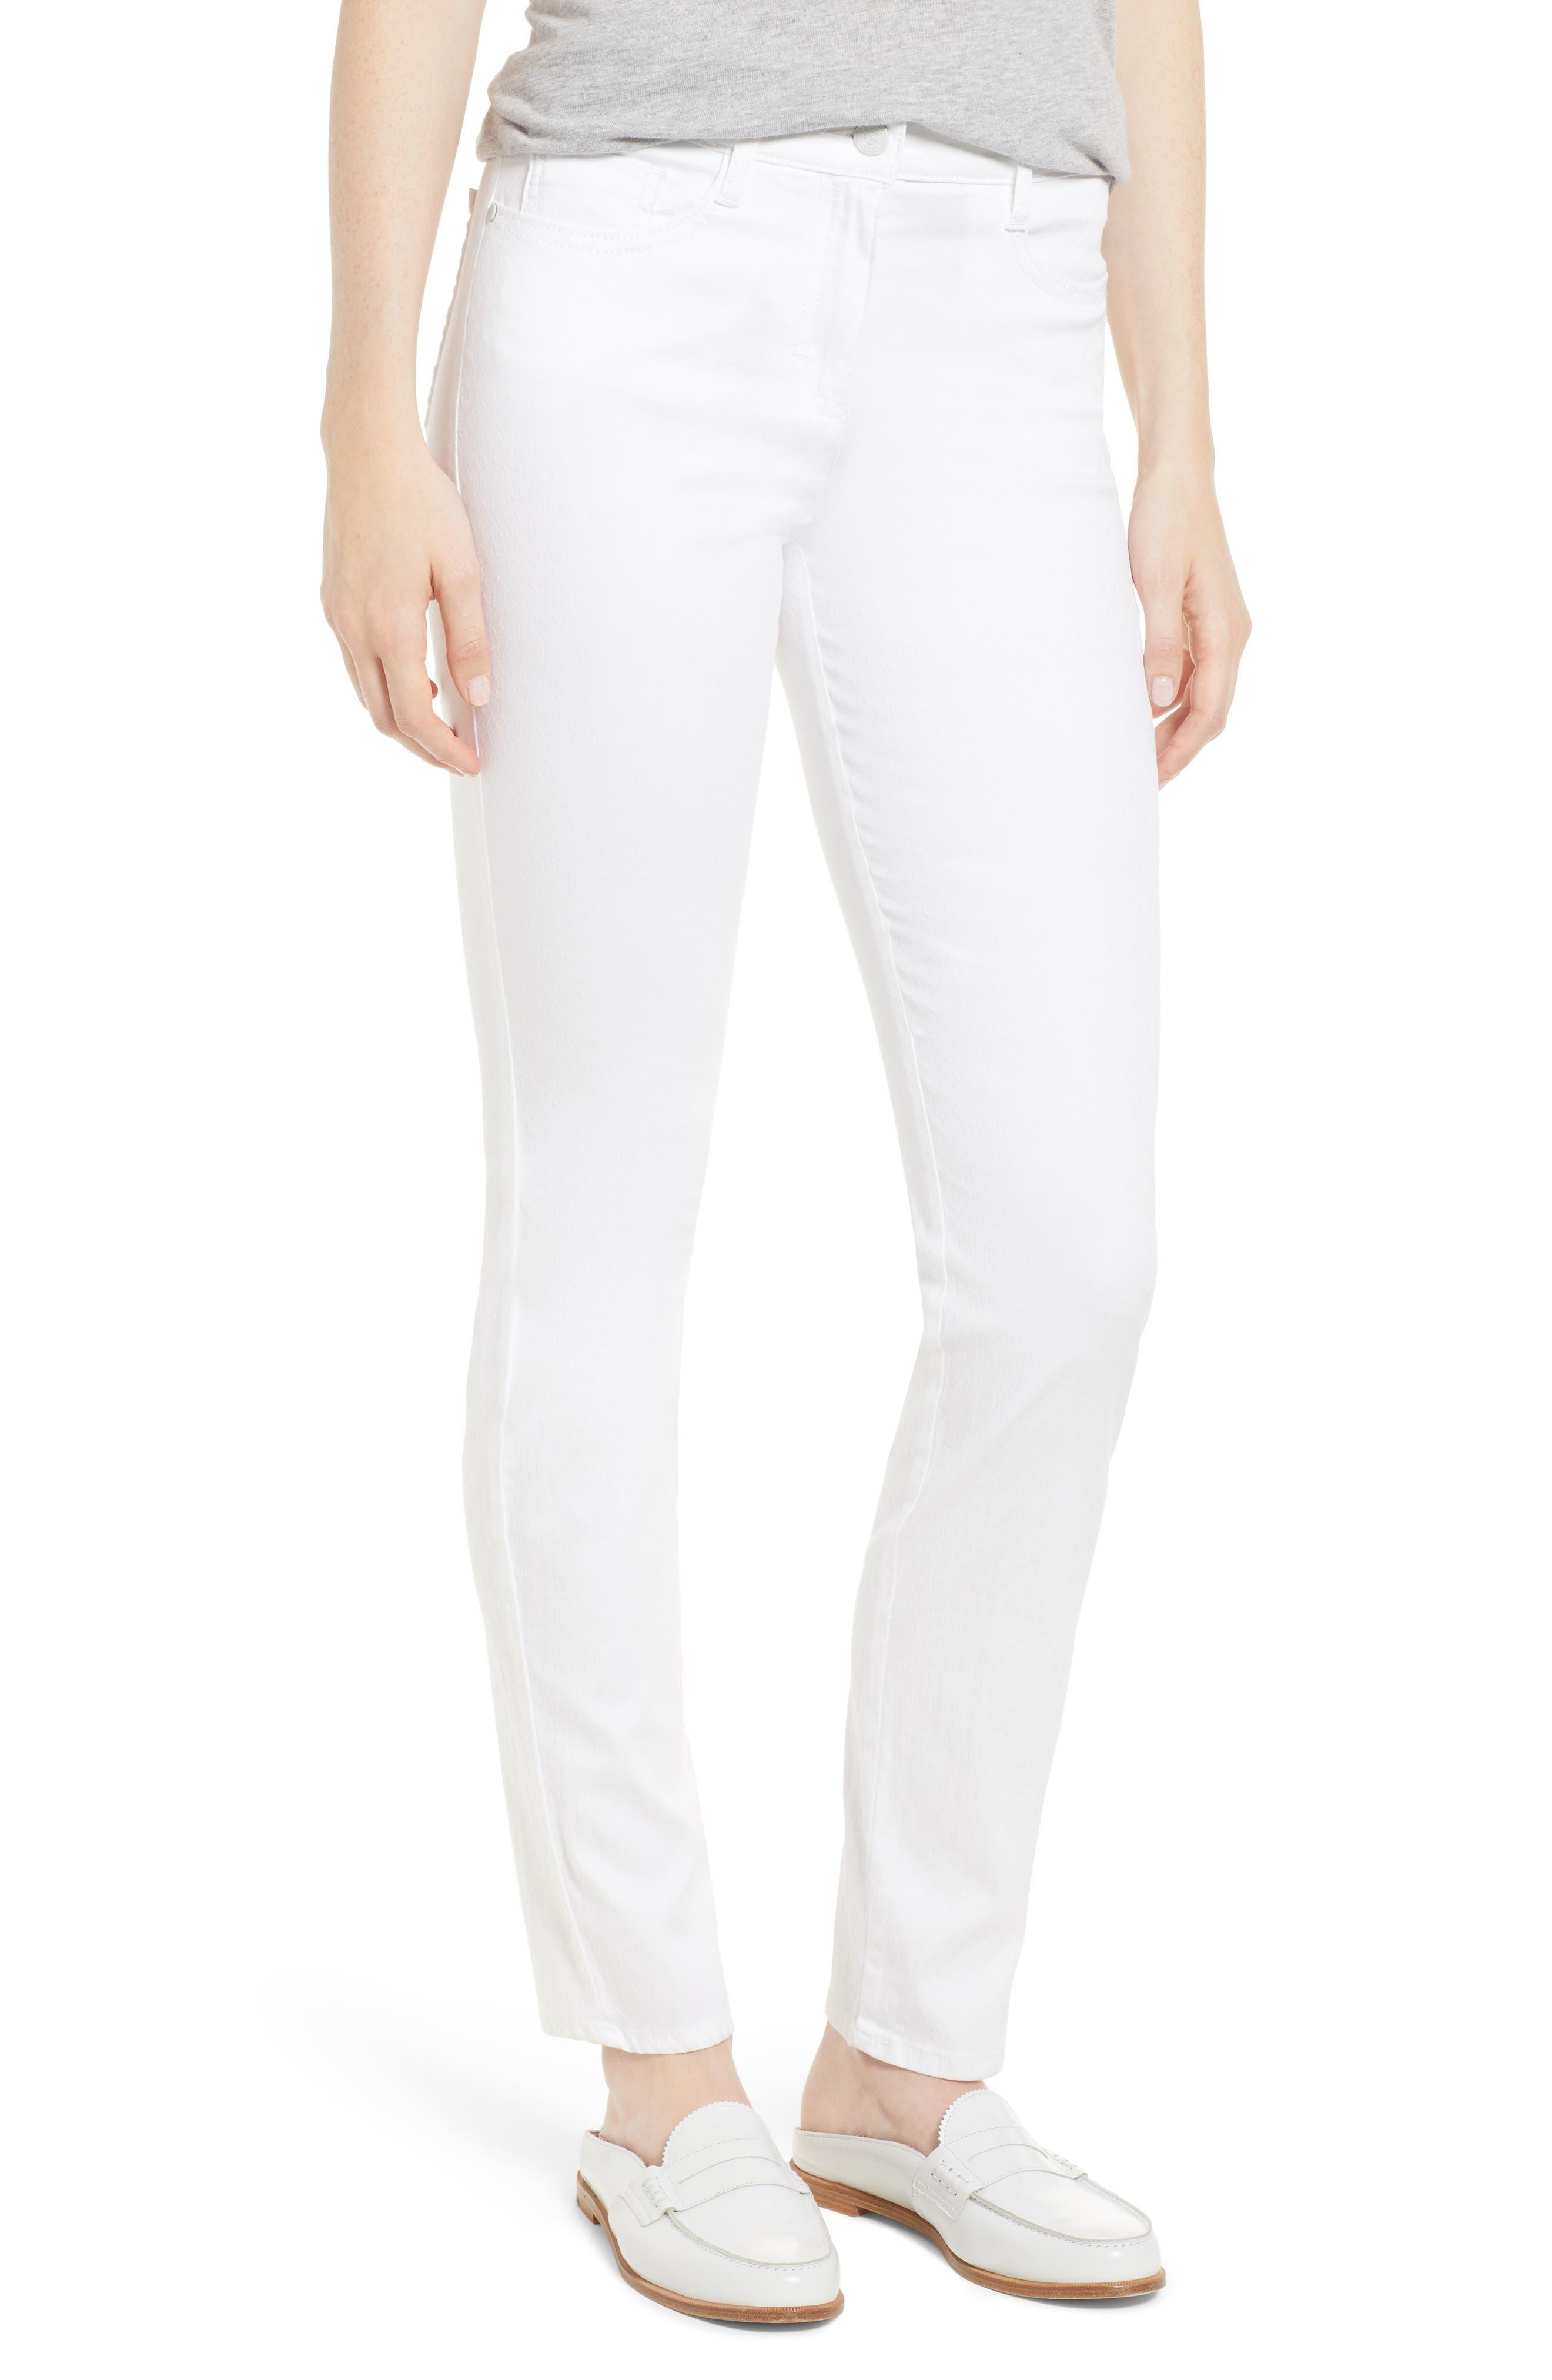 Brax Shakira White Jeans